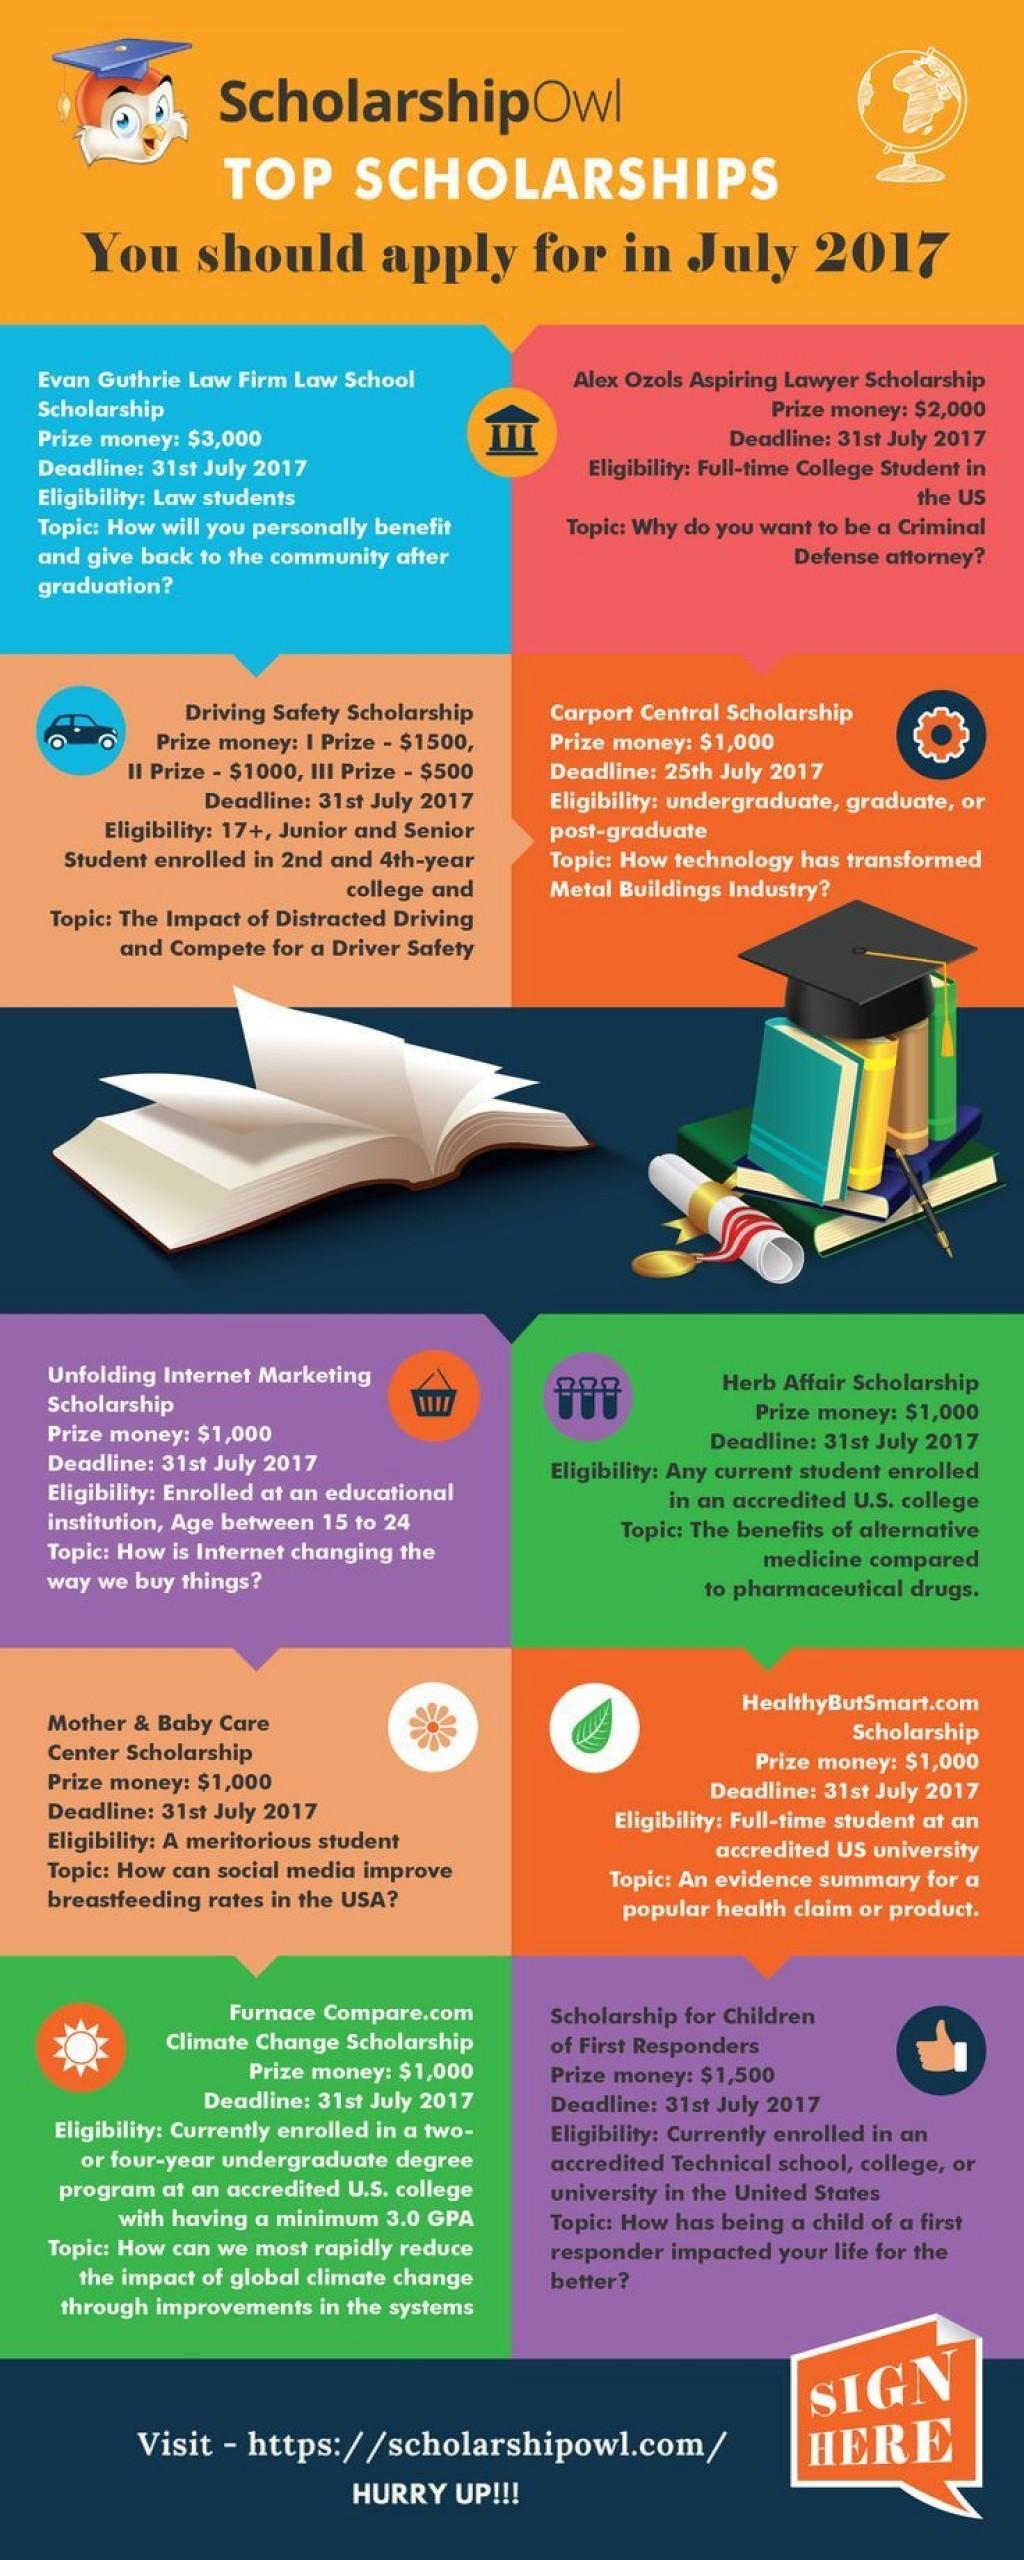 011 Essay Example Scholarships Wonderful 2017 No College Canada Large